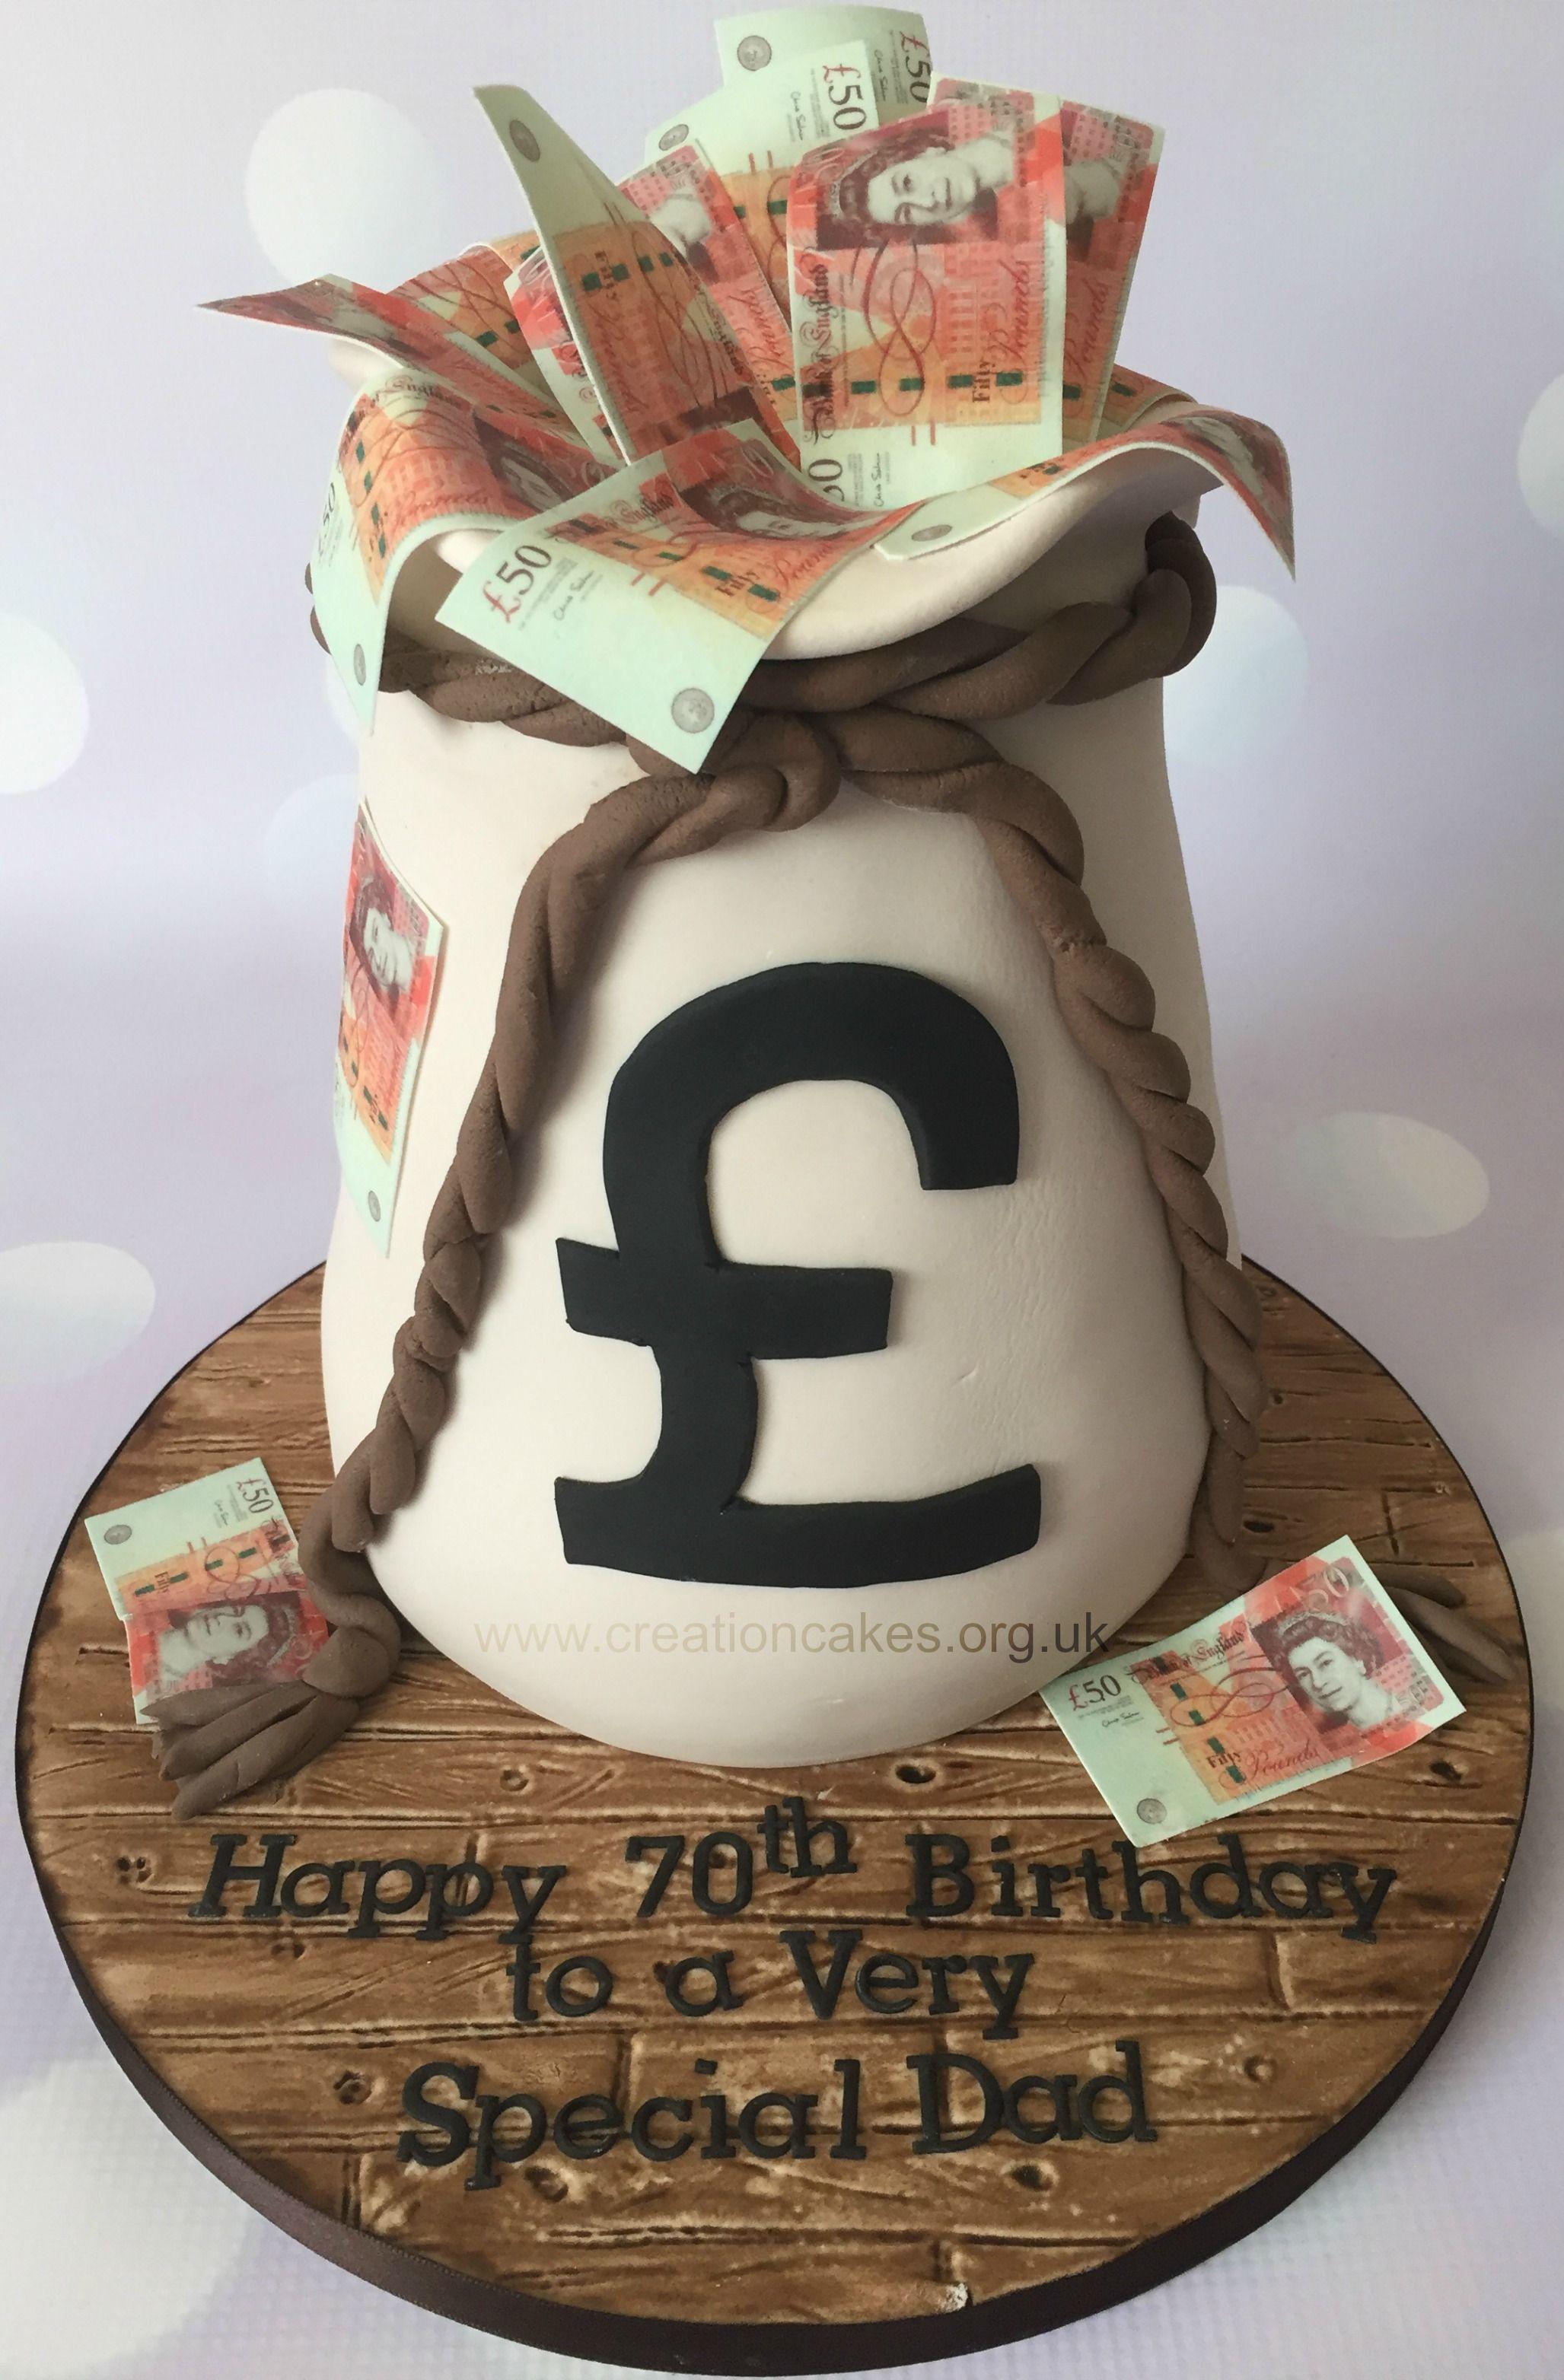 Astonishing Bag Of Money Cake Birthday Birthday Cake Funny Birthday Cards Online Kookostrdamsfinfo